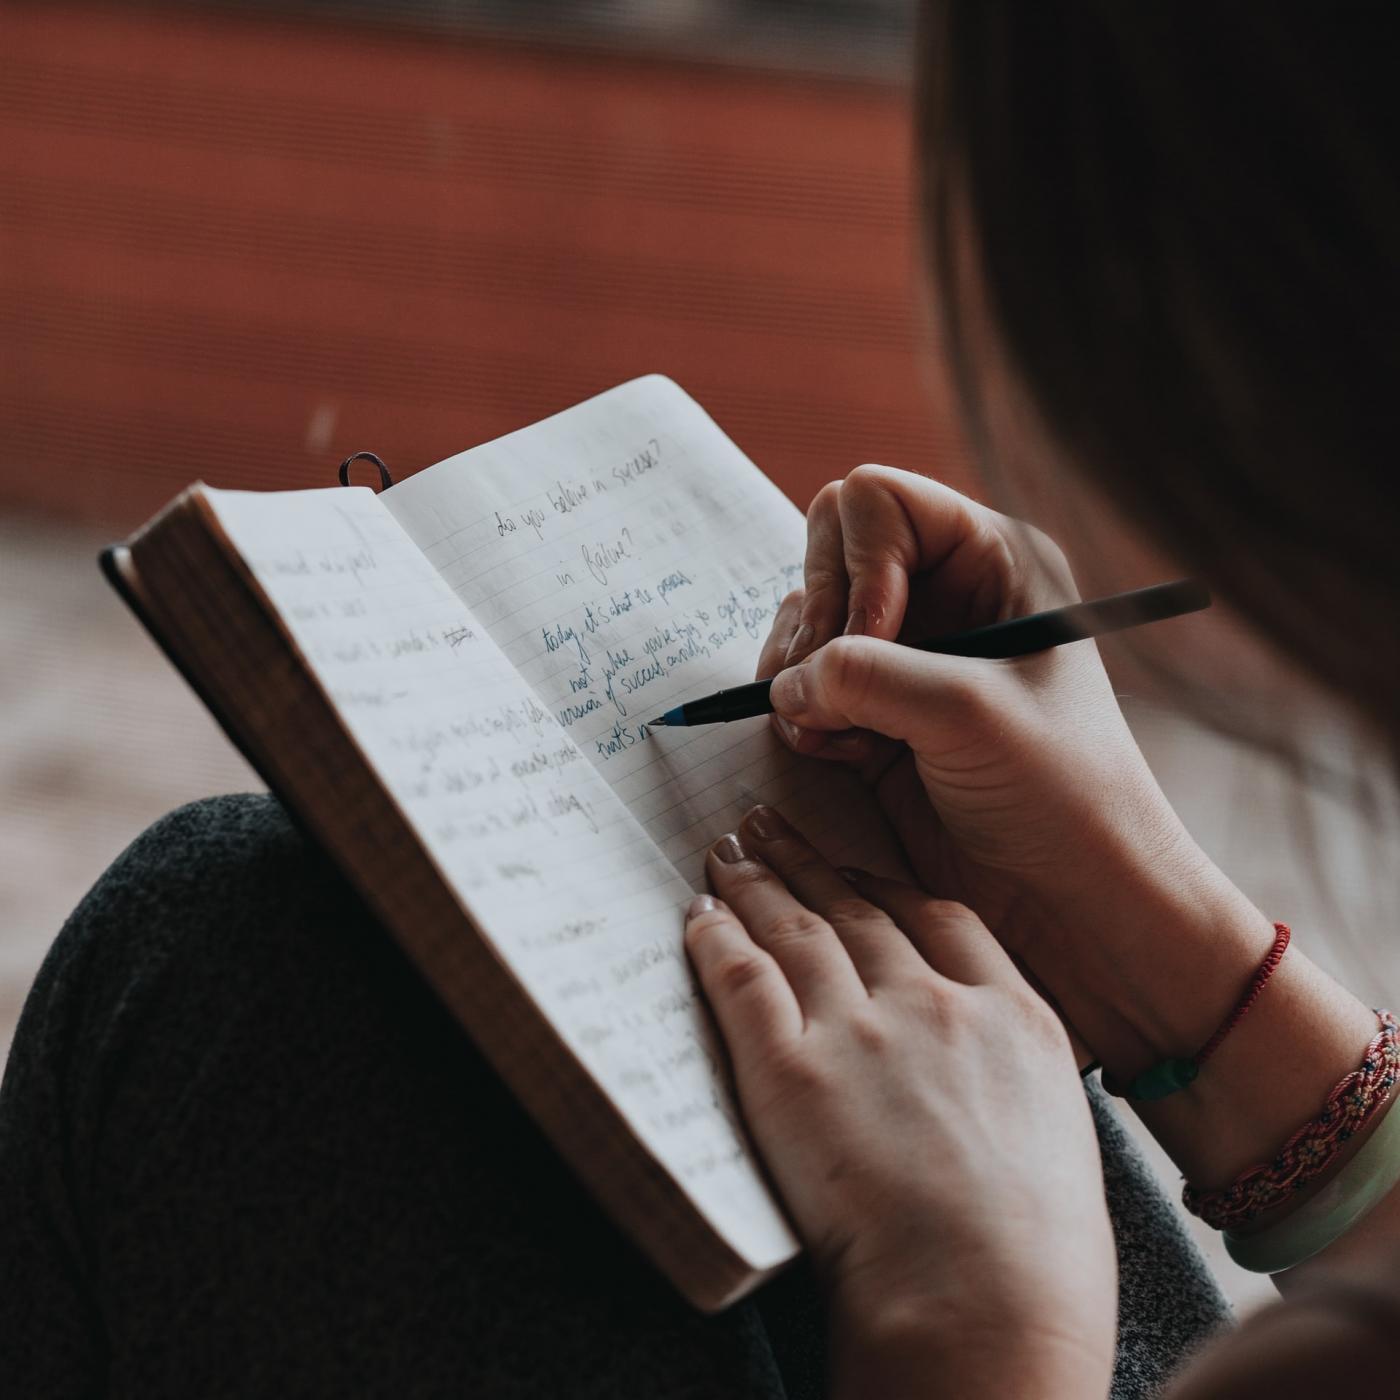 Llandudno Writers Guild: Stories so far